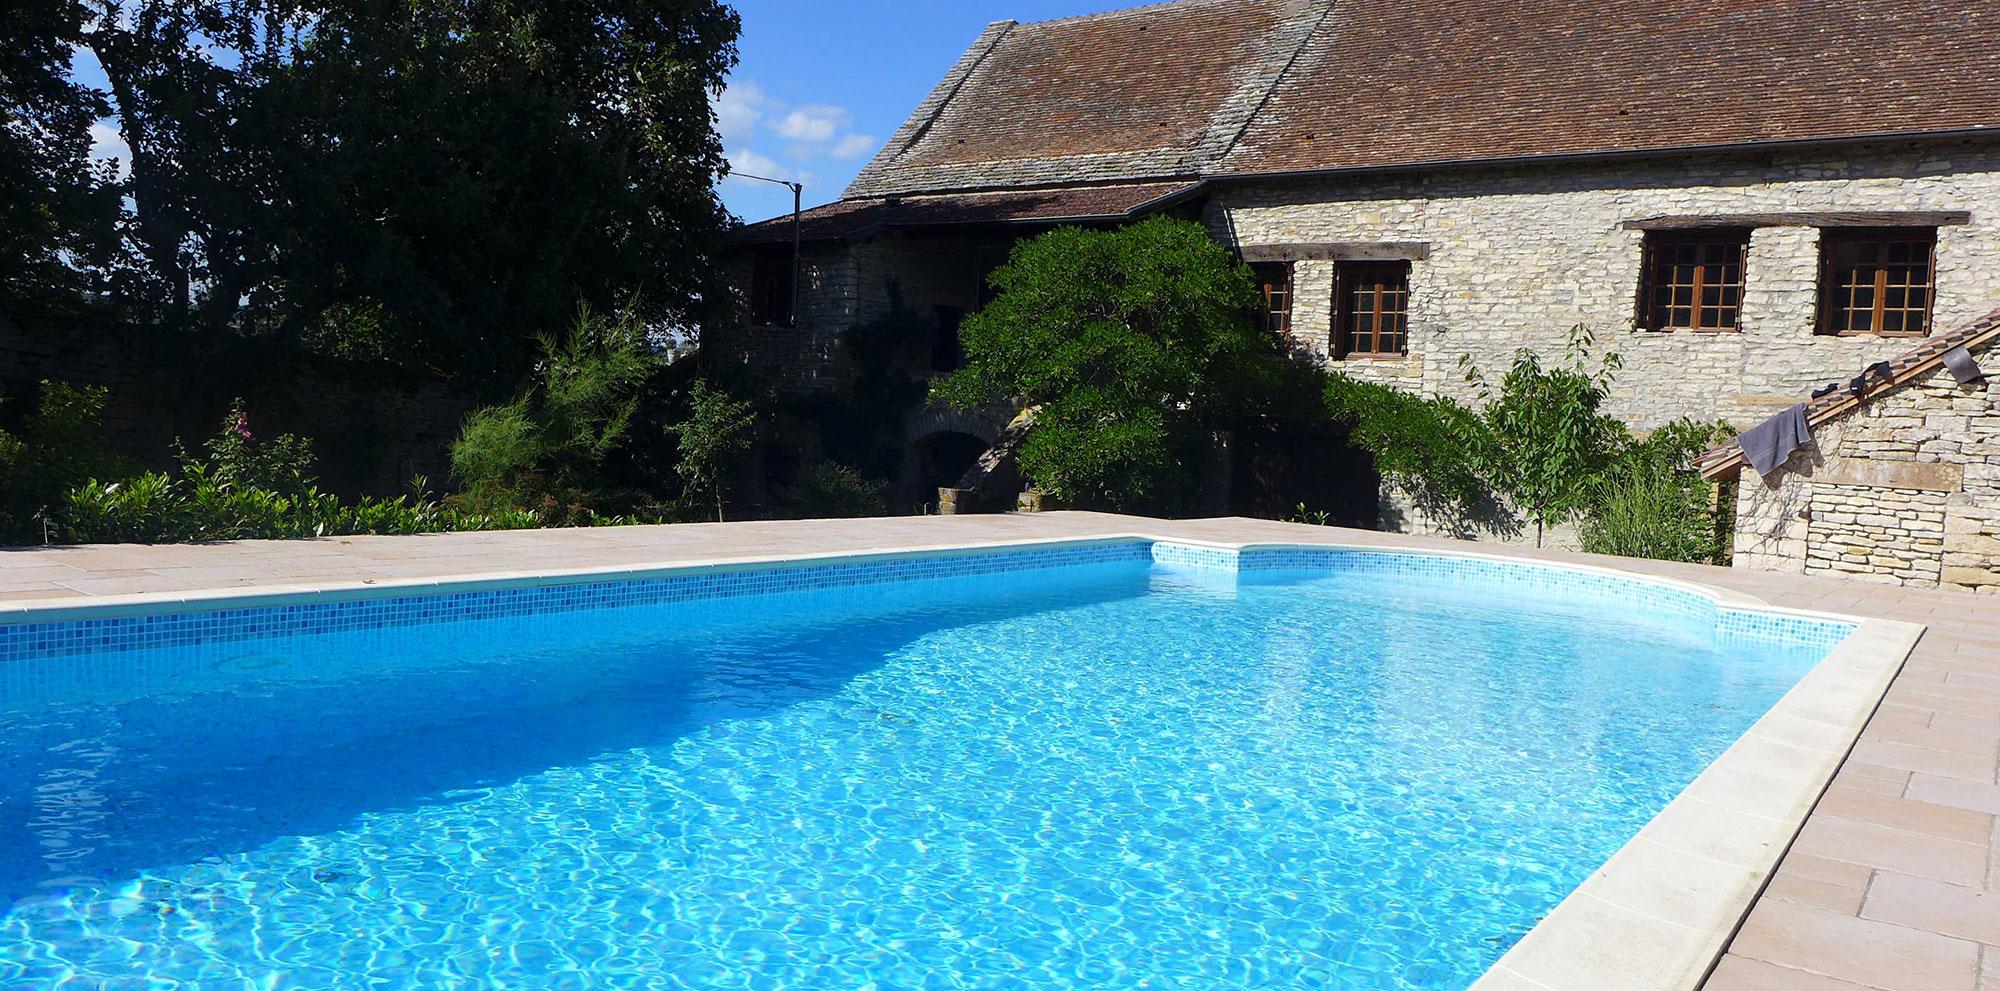 piscine maison en pierre